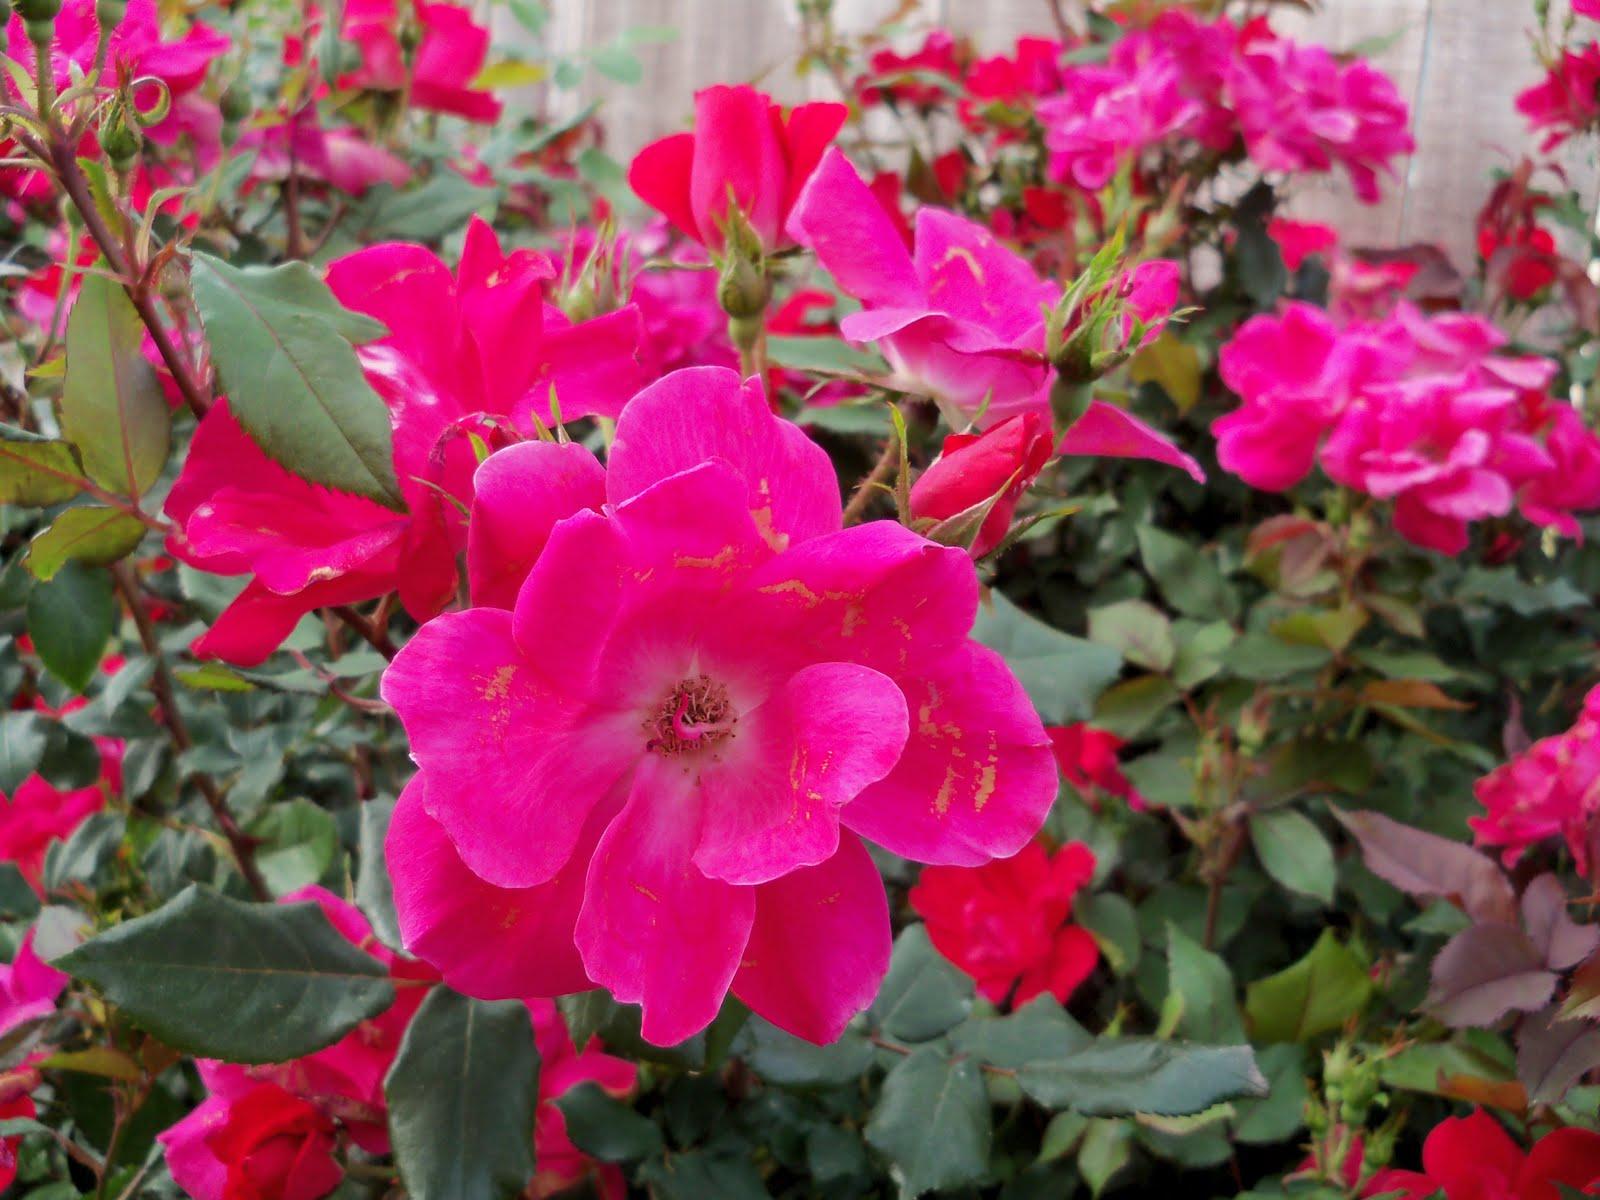 Gardening 2010 - 101_0876.JPG